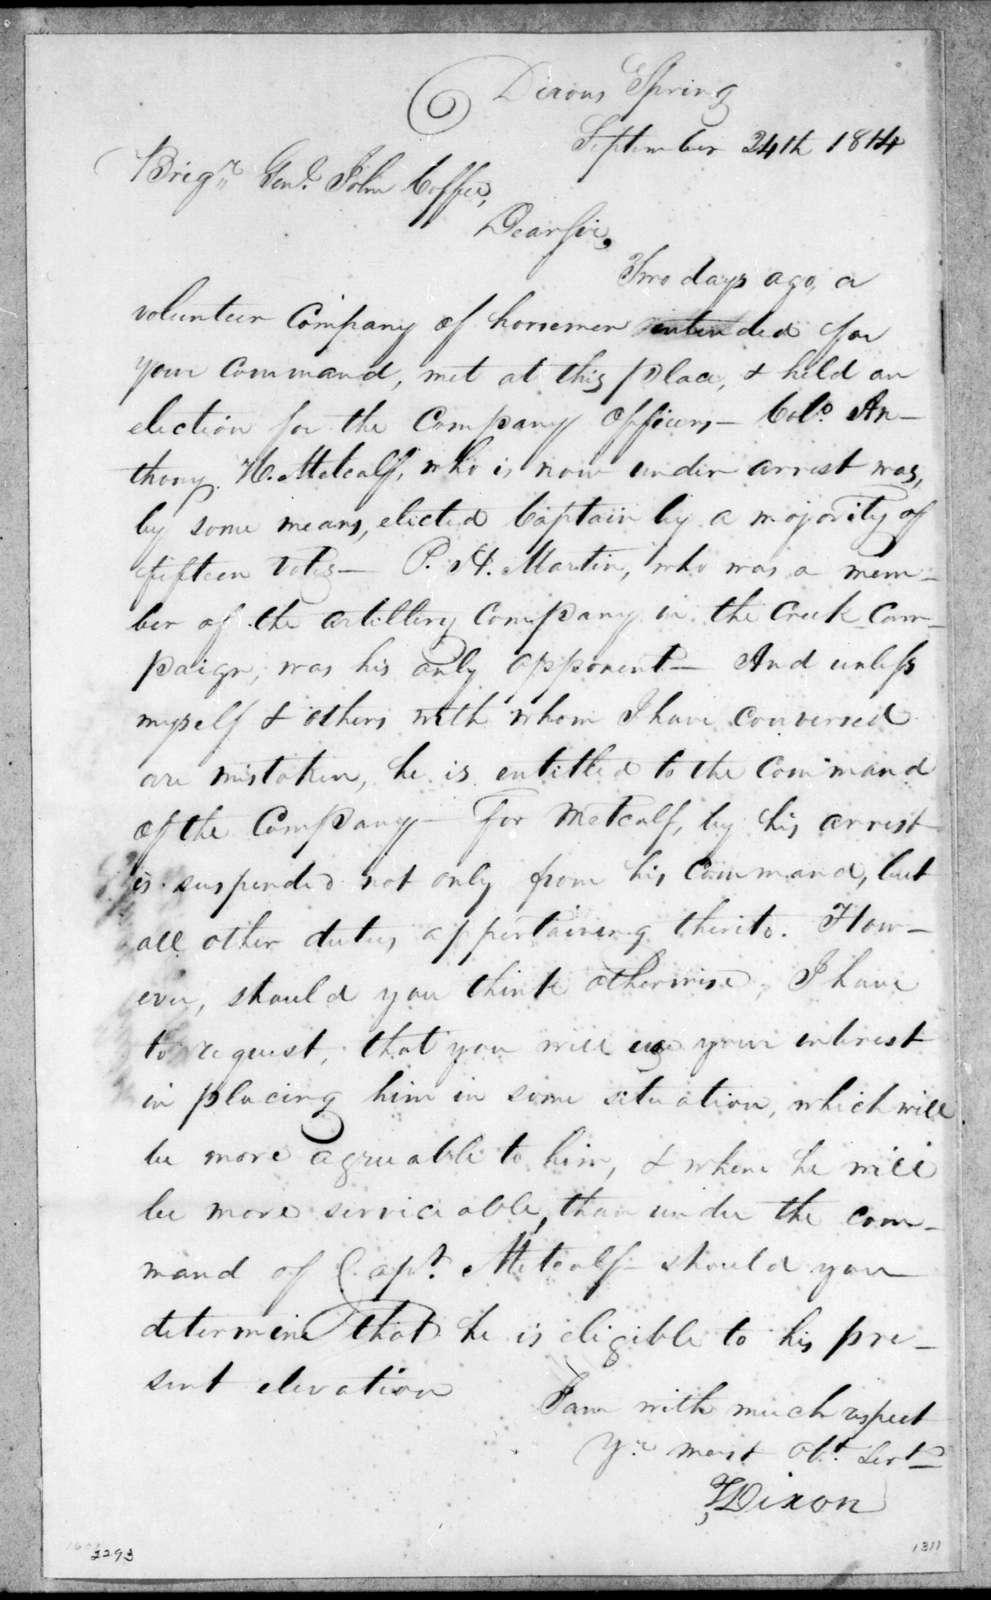 T. Dixon to John Coffee, September 24, 1814